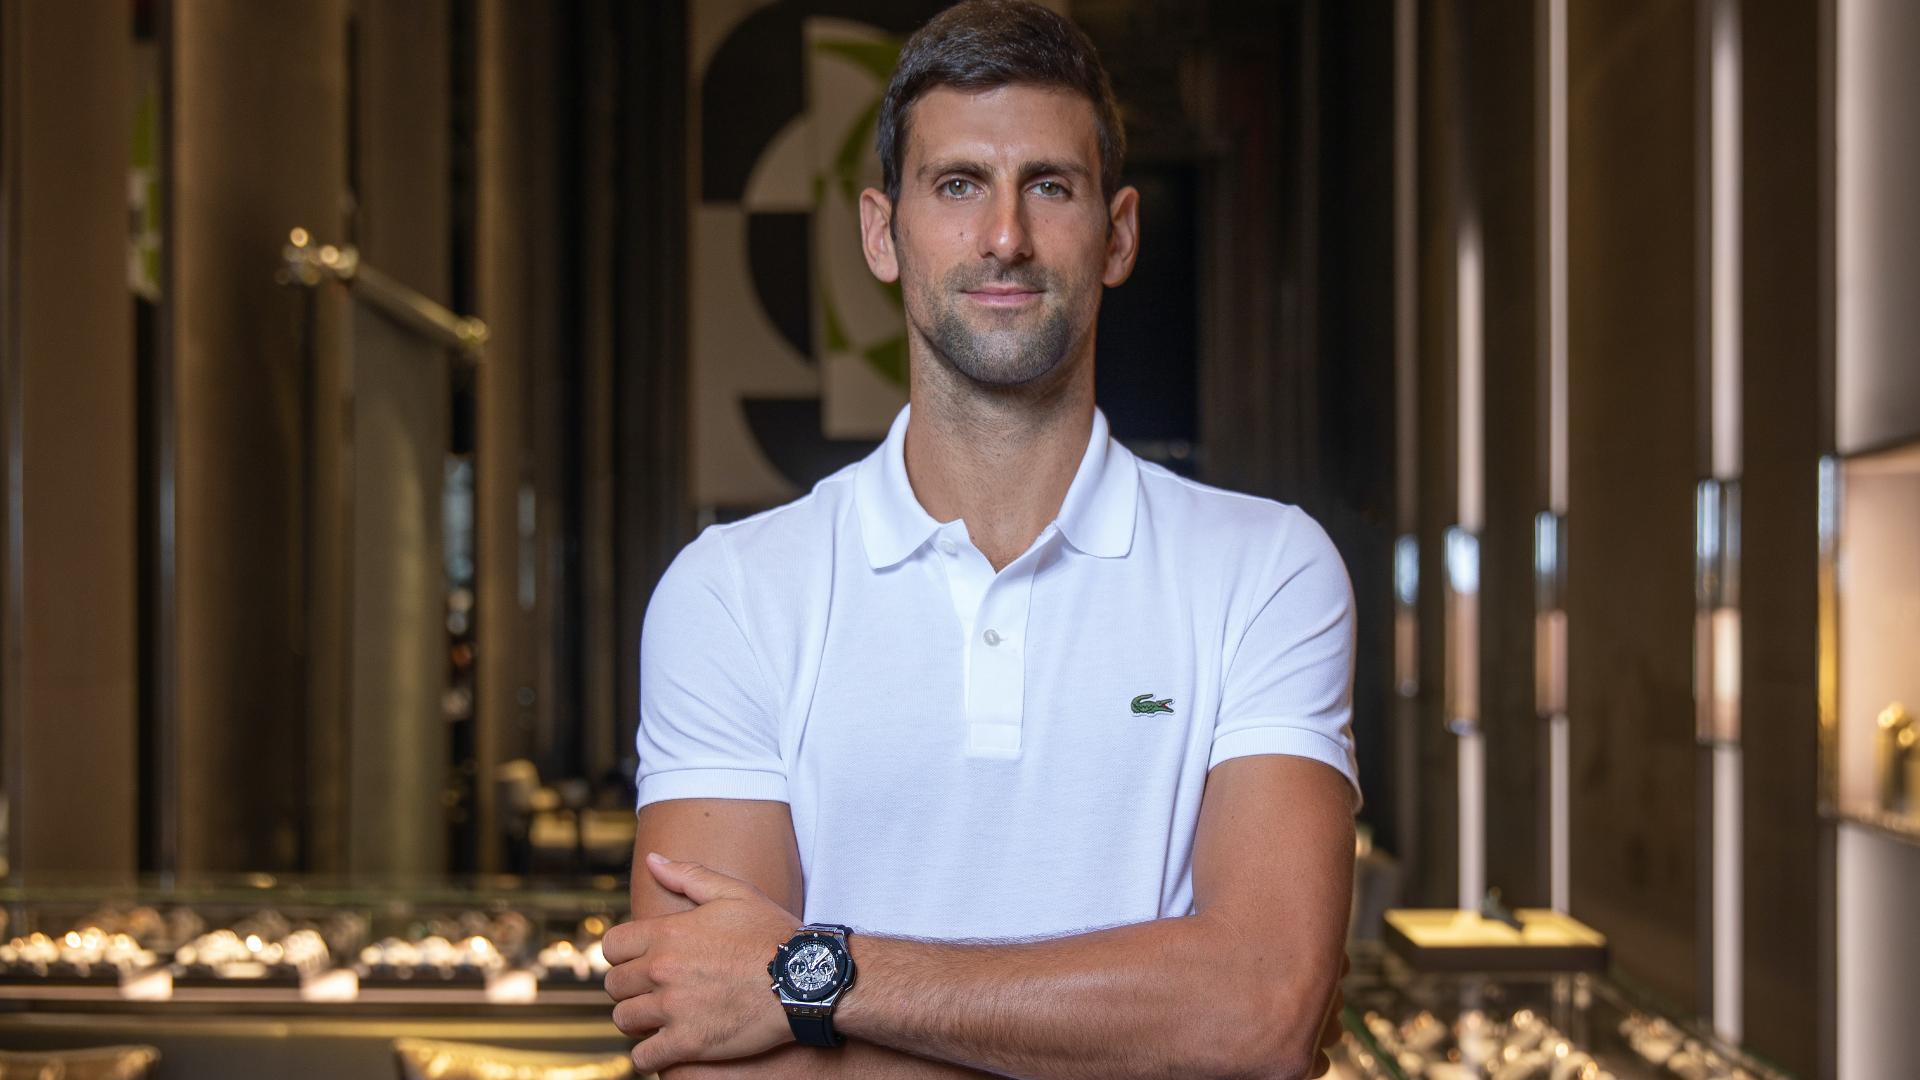 Novak Djokovic Is Now A Hublot Ambassador - Boss Hunting